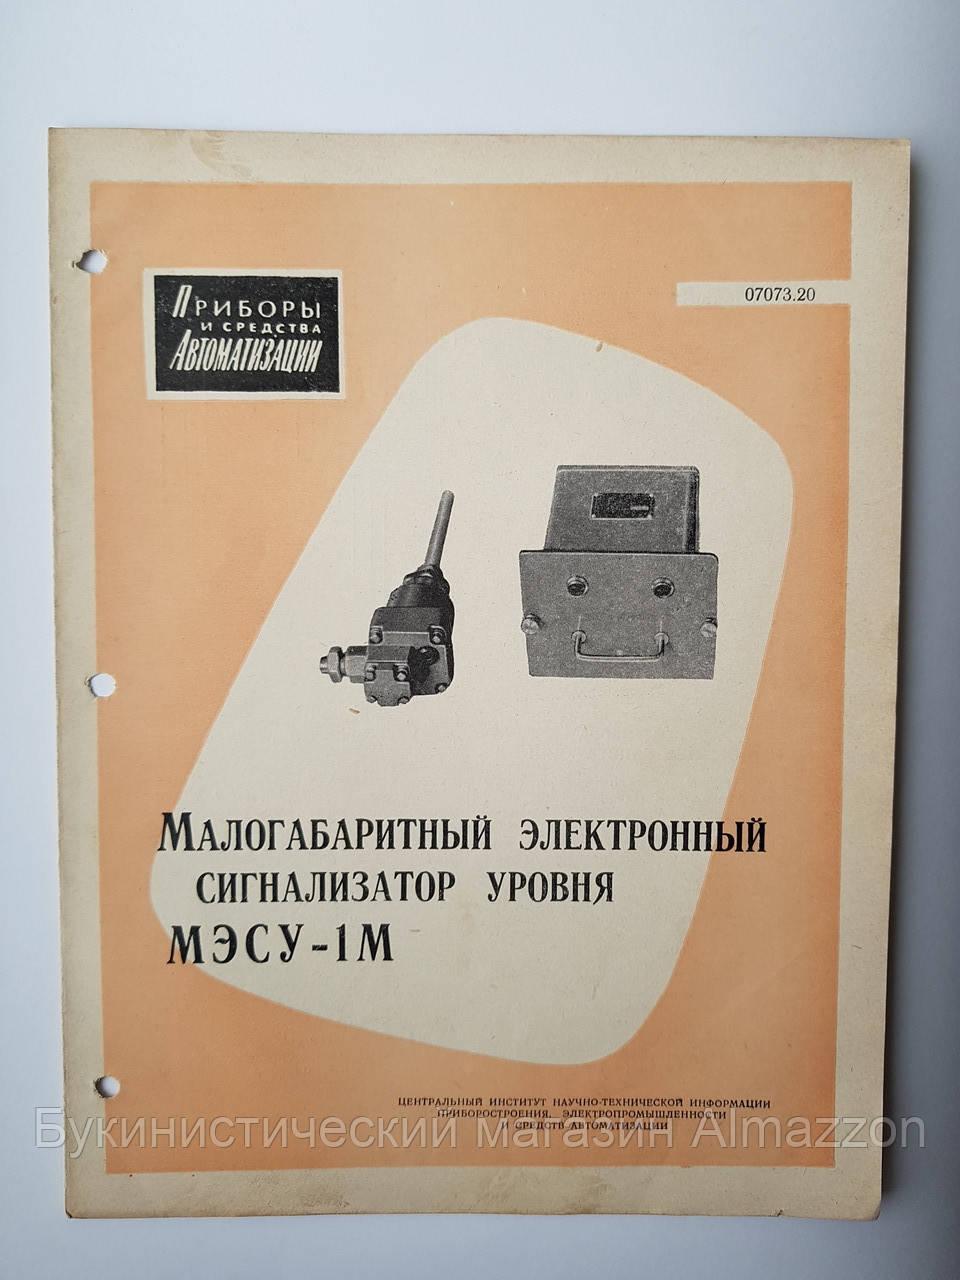 "Журнал (Бюллетень) ""Малогабаритный электронный сигнализатор уровня МЭСУ-1М  07073.20"" 1963г."